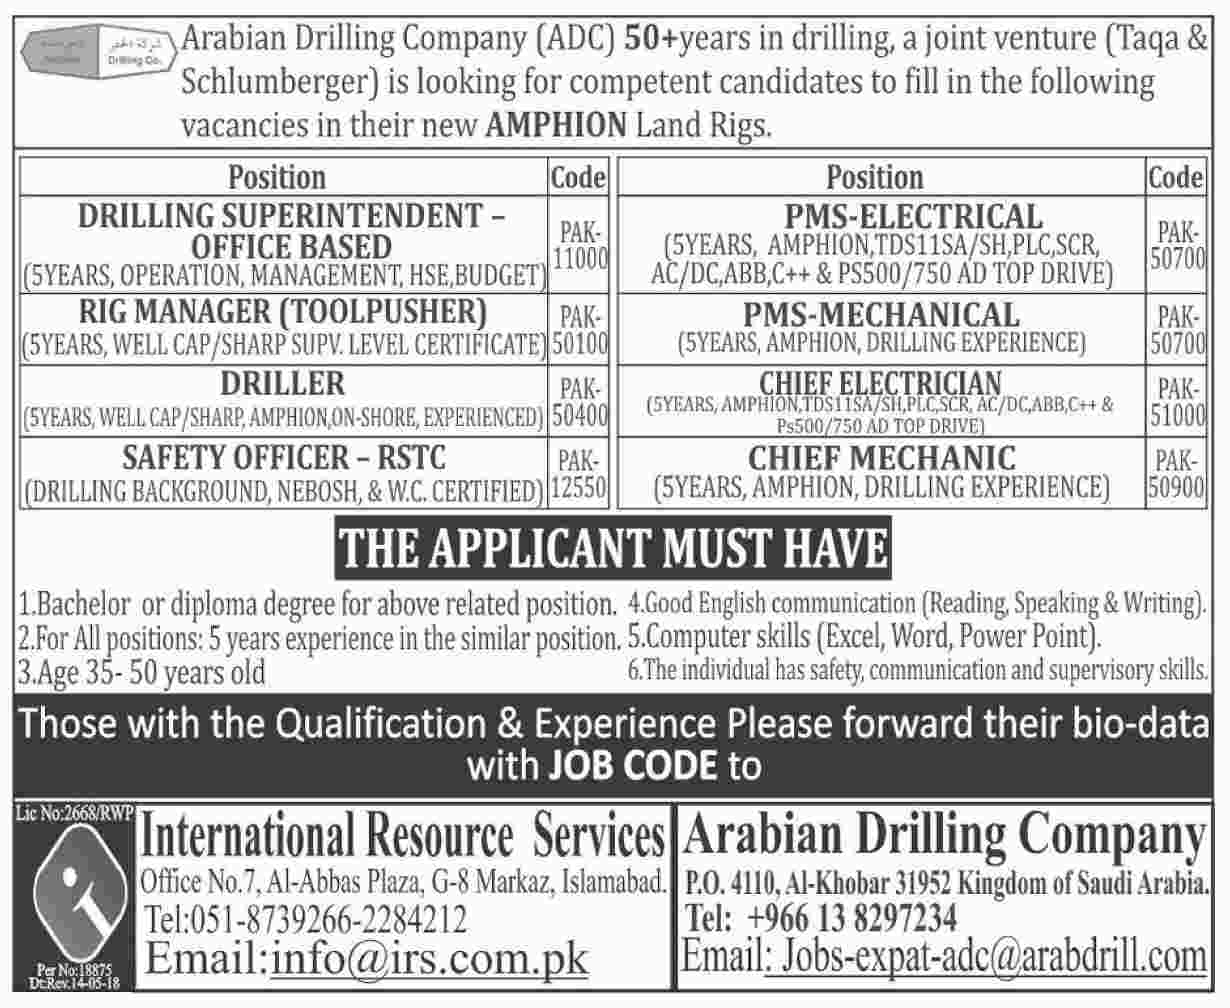 Arabian Drilling Company (ADC) Saudi Arabia Jobs - Latest Career PK